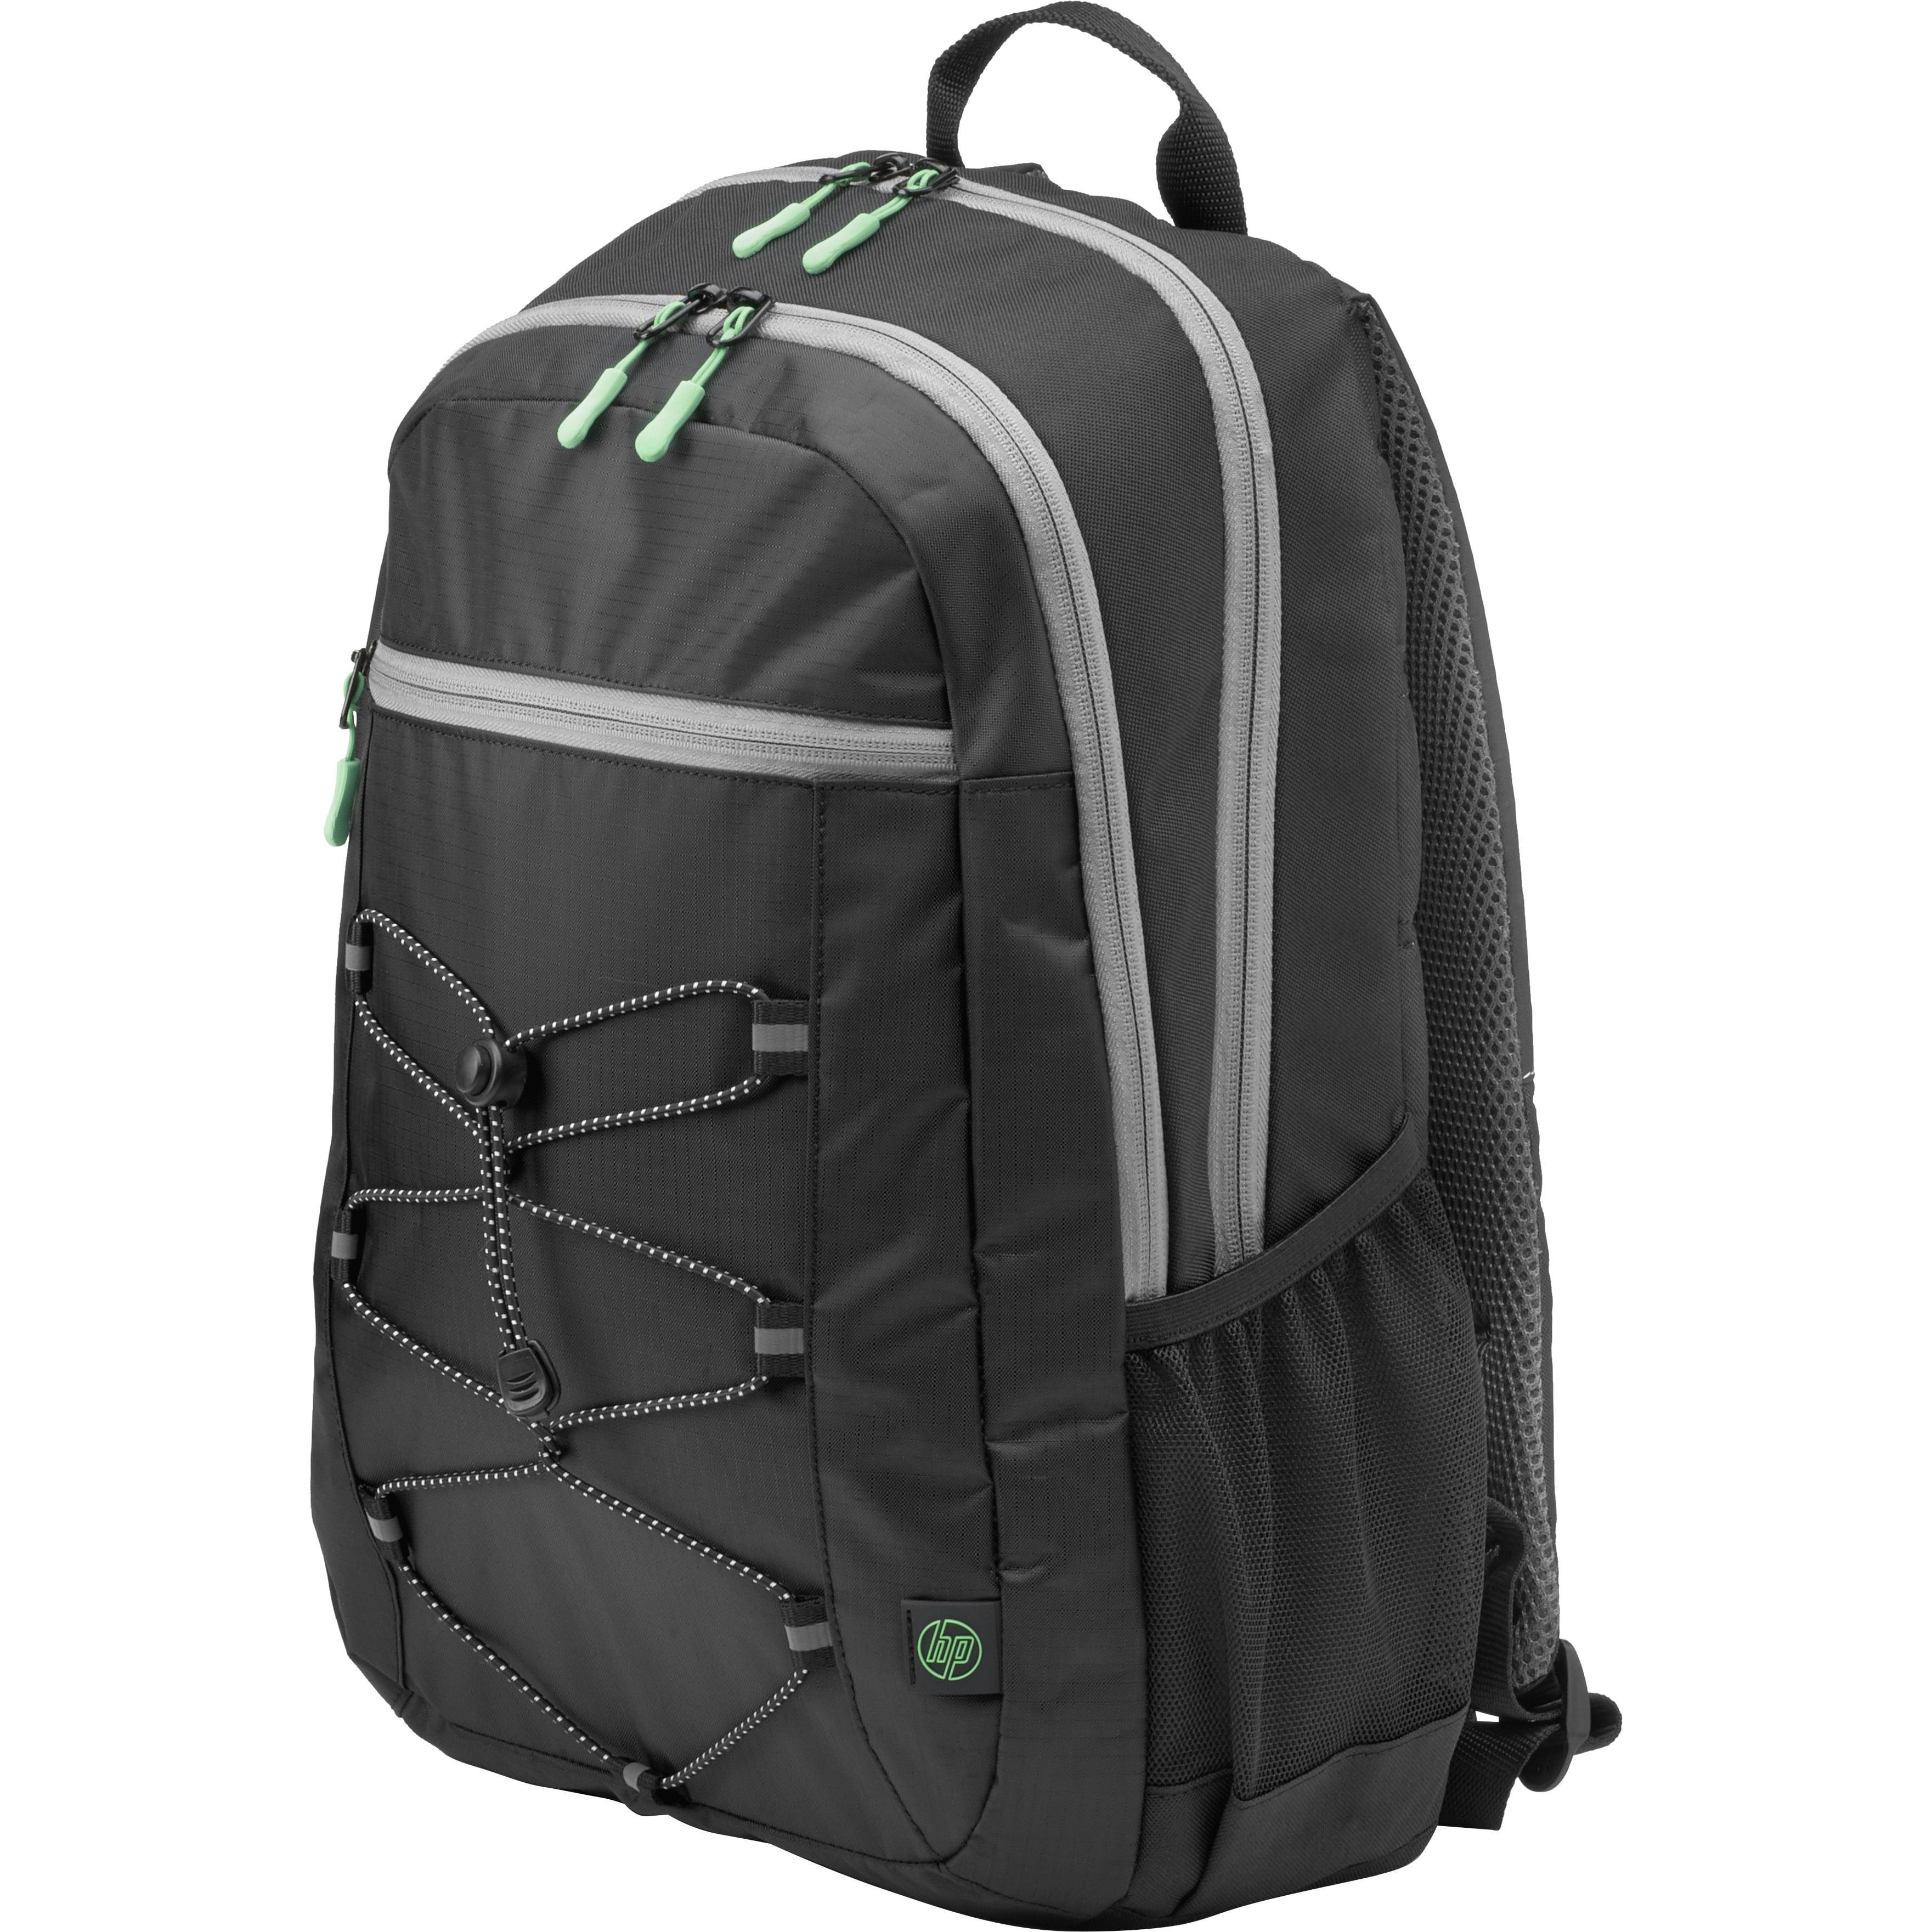 "(15.6"") Active Backpack (Black/Mint Green)"